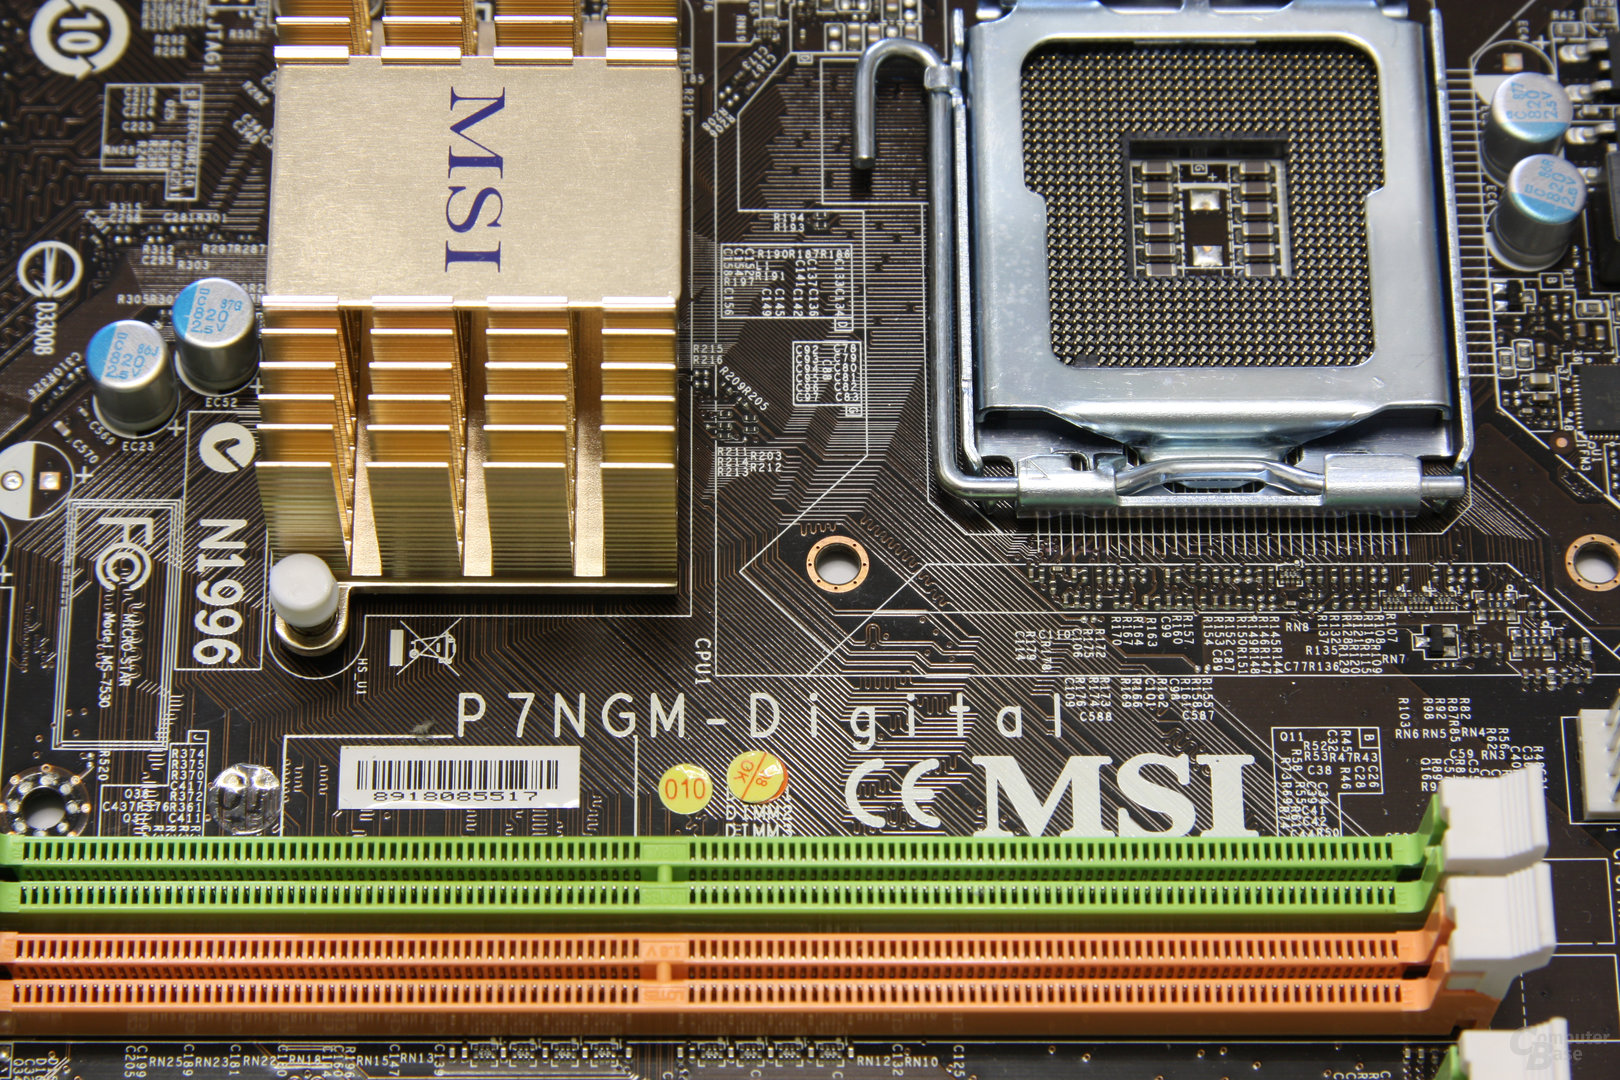 MSI P7NGM-Digital Aufschrift